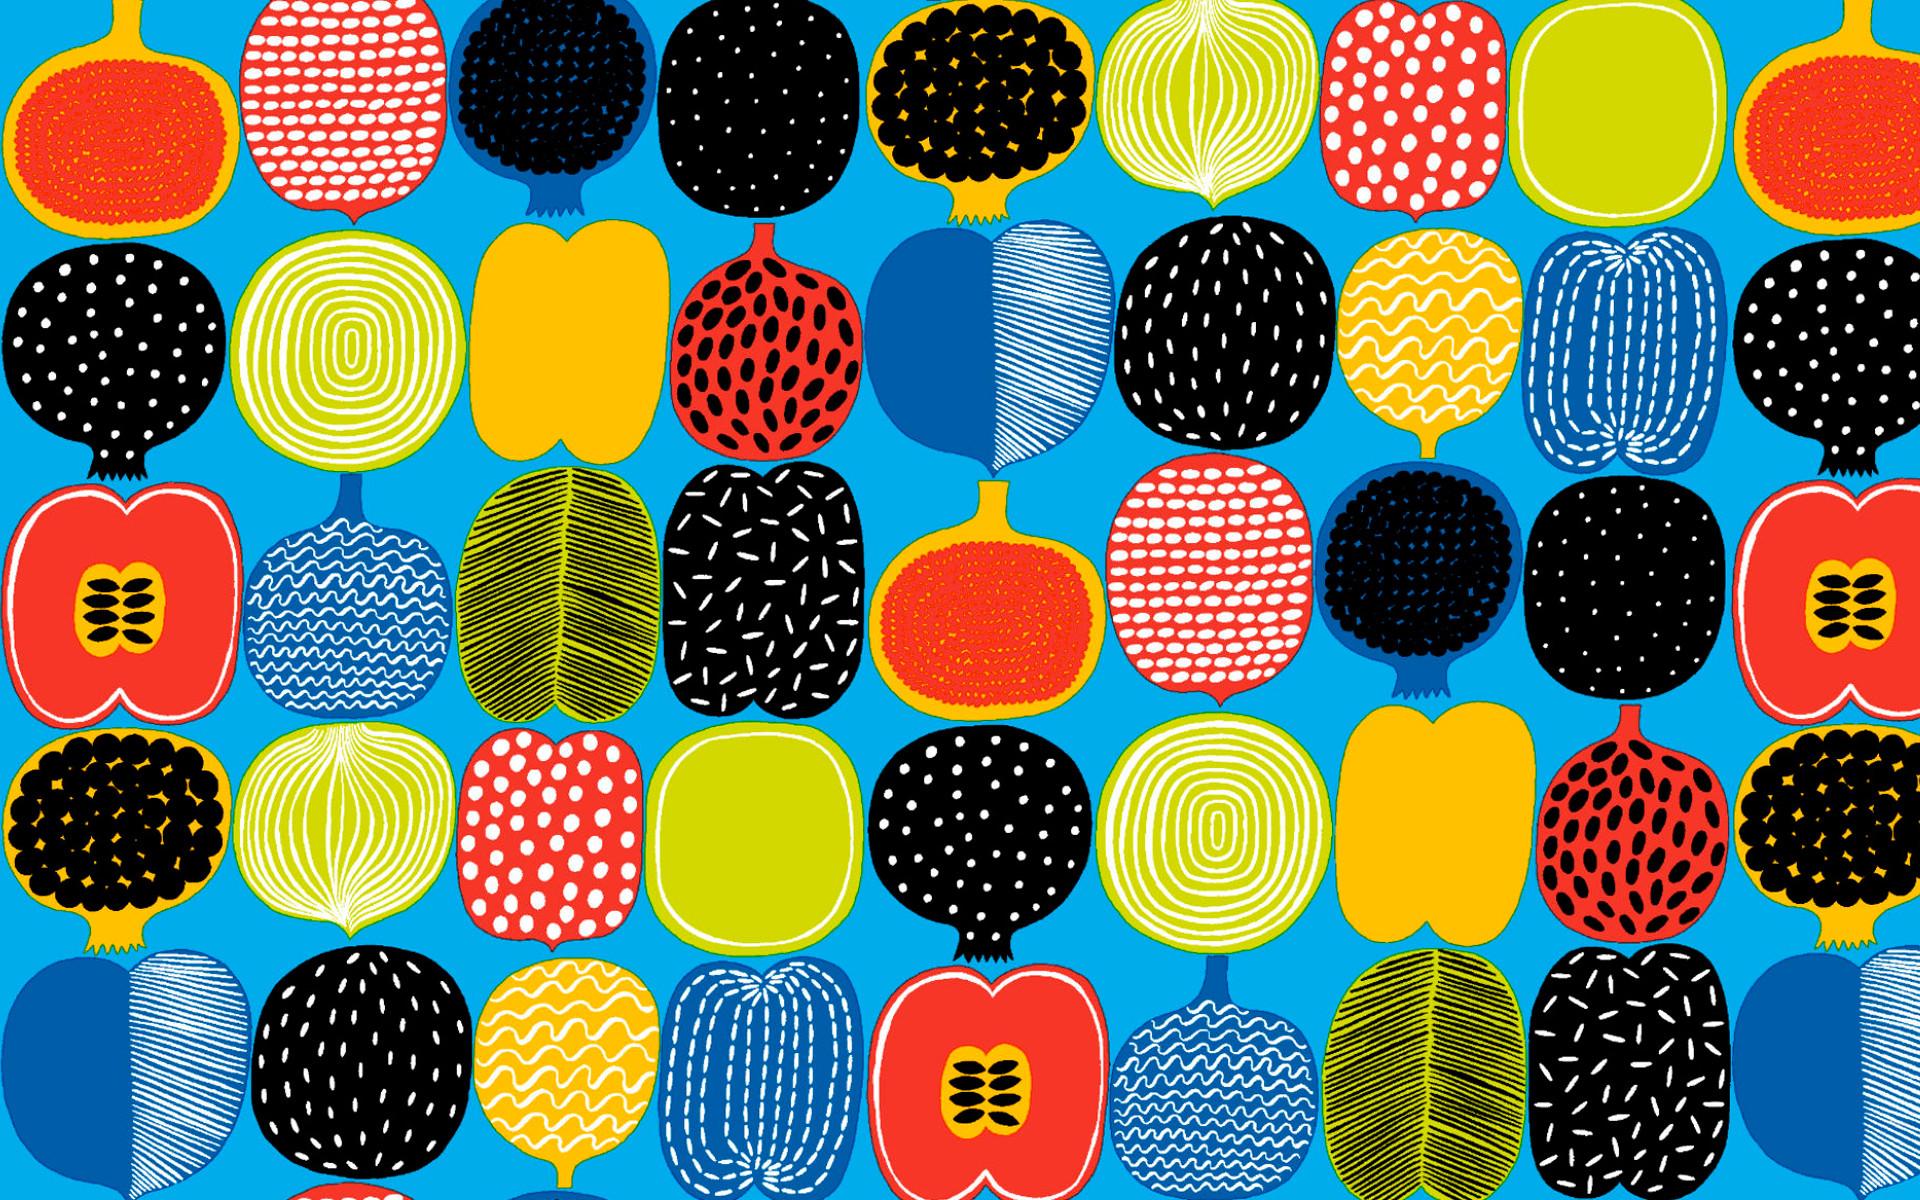 Marimekko Desktop Wallpapers – Marimekko Design Ideas